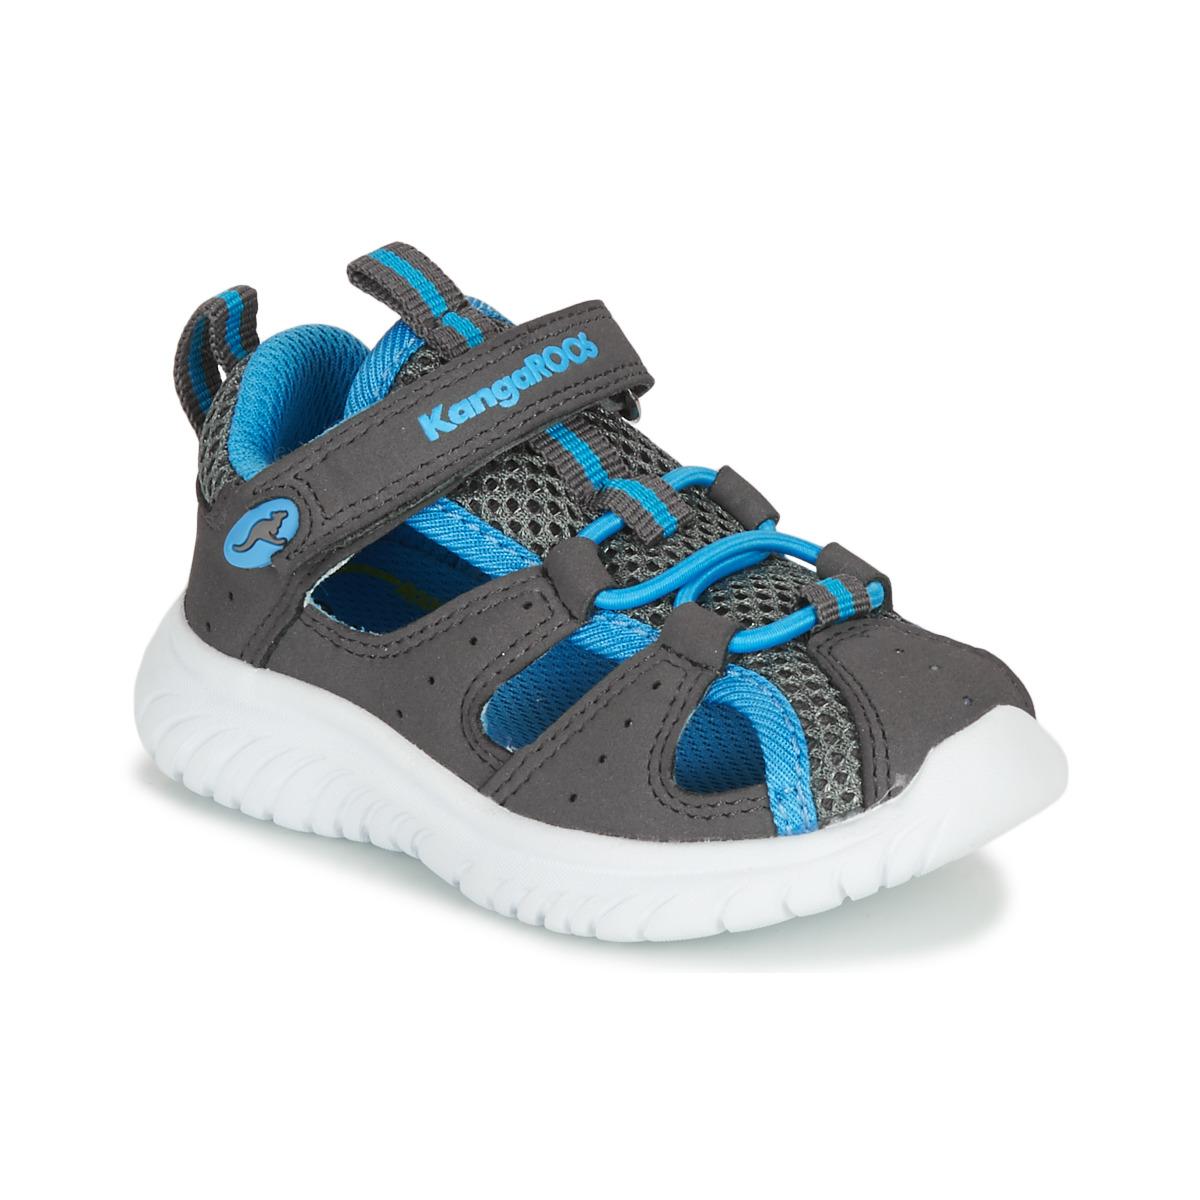 Sandaler til børn Kangaroos  KI-Rock Lite EV